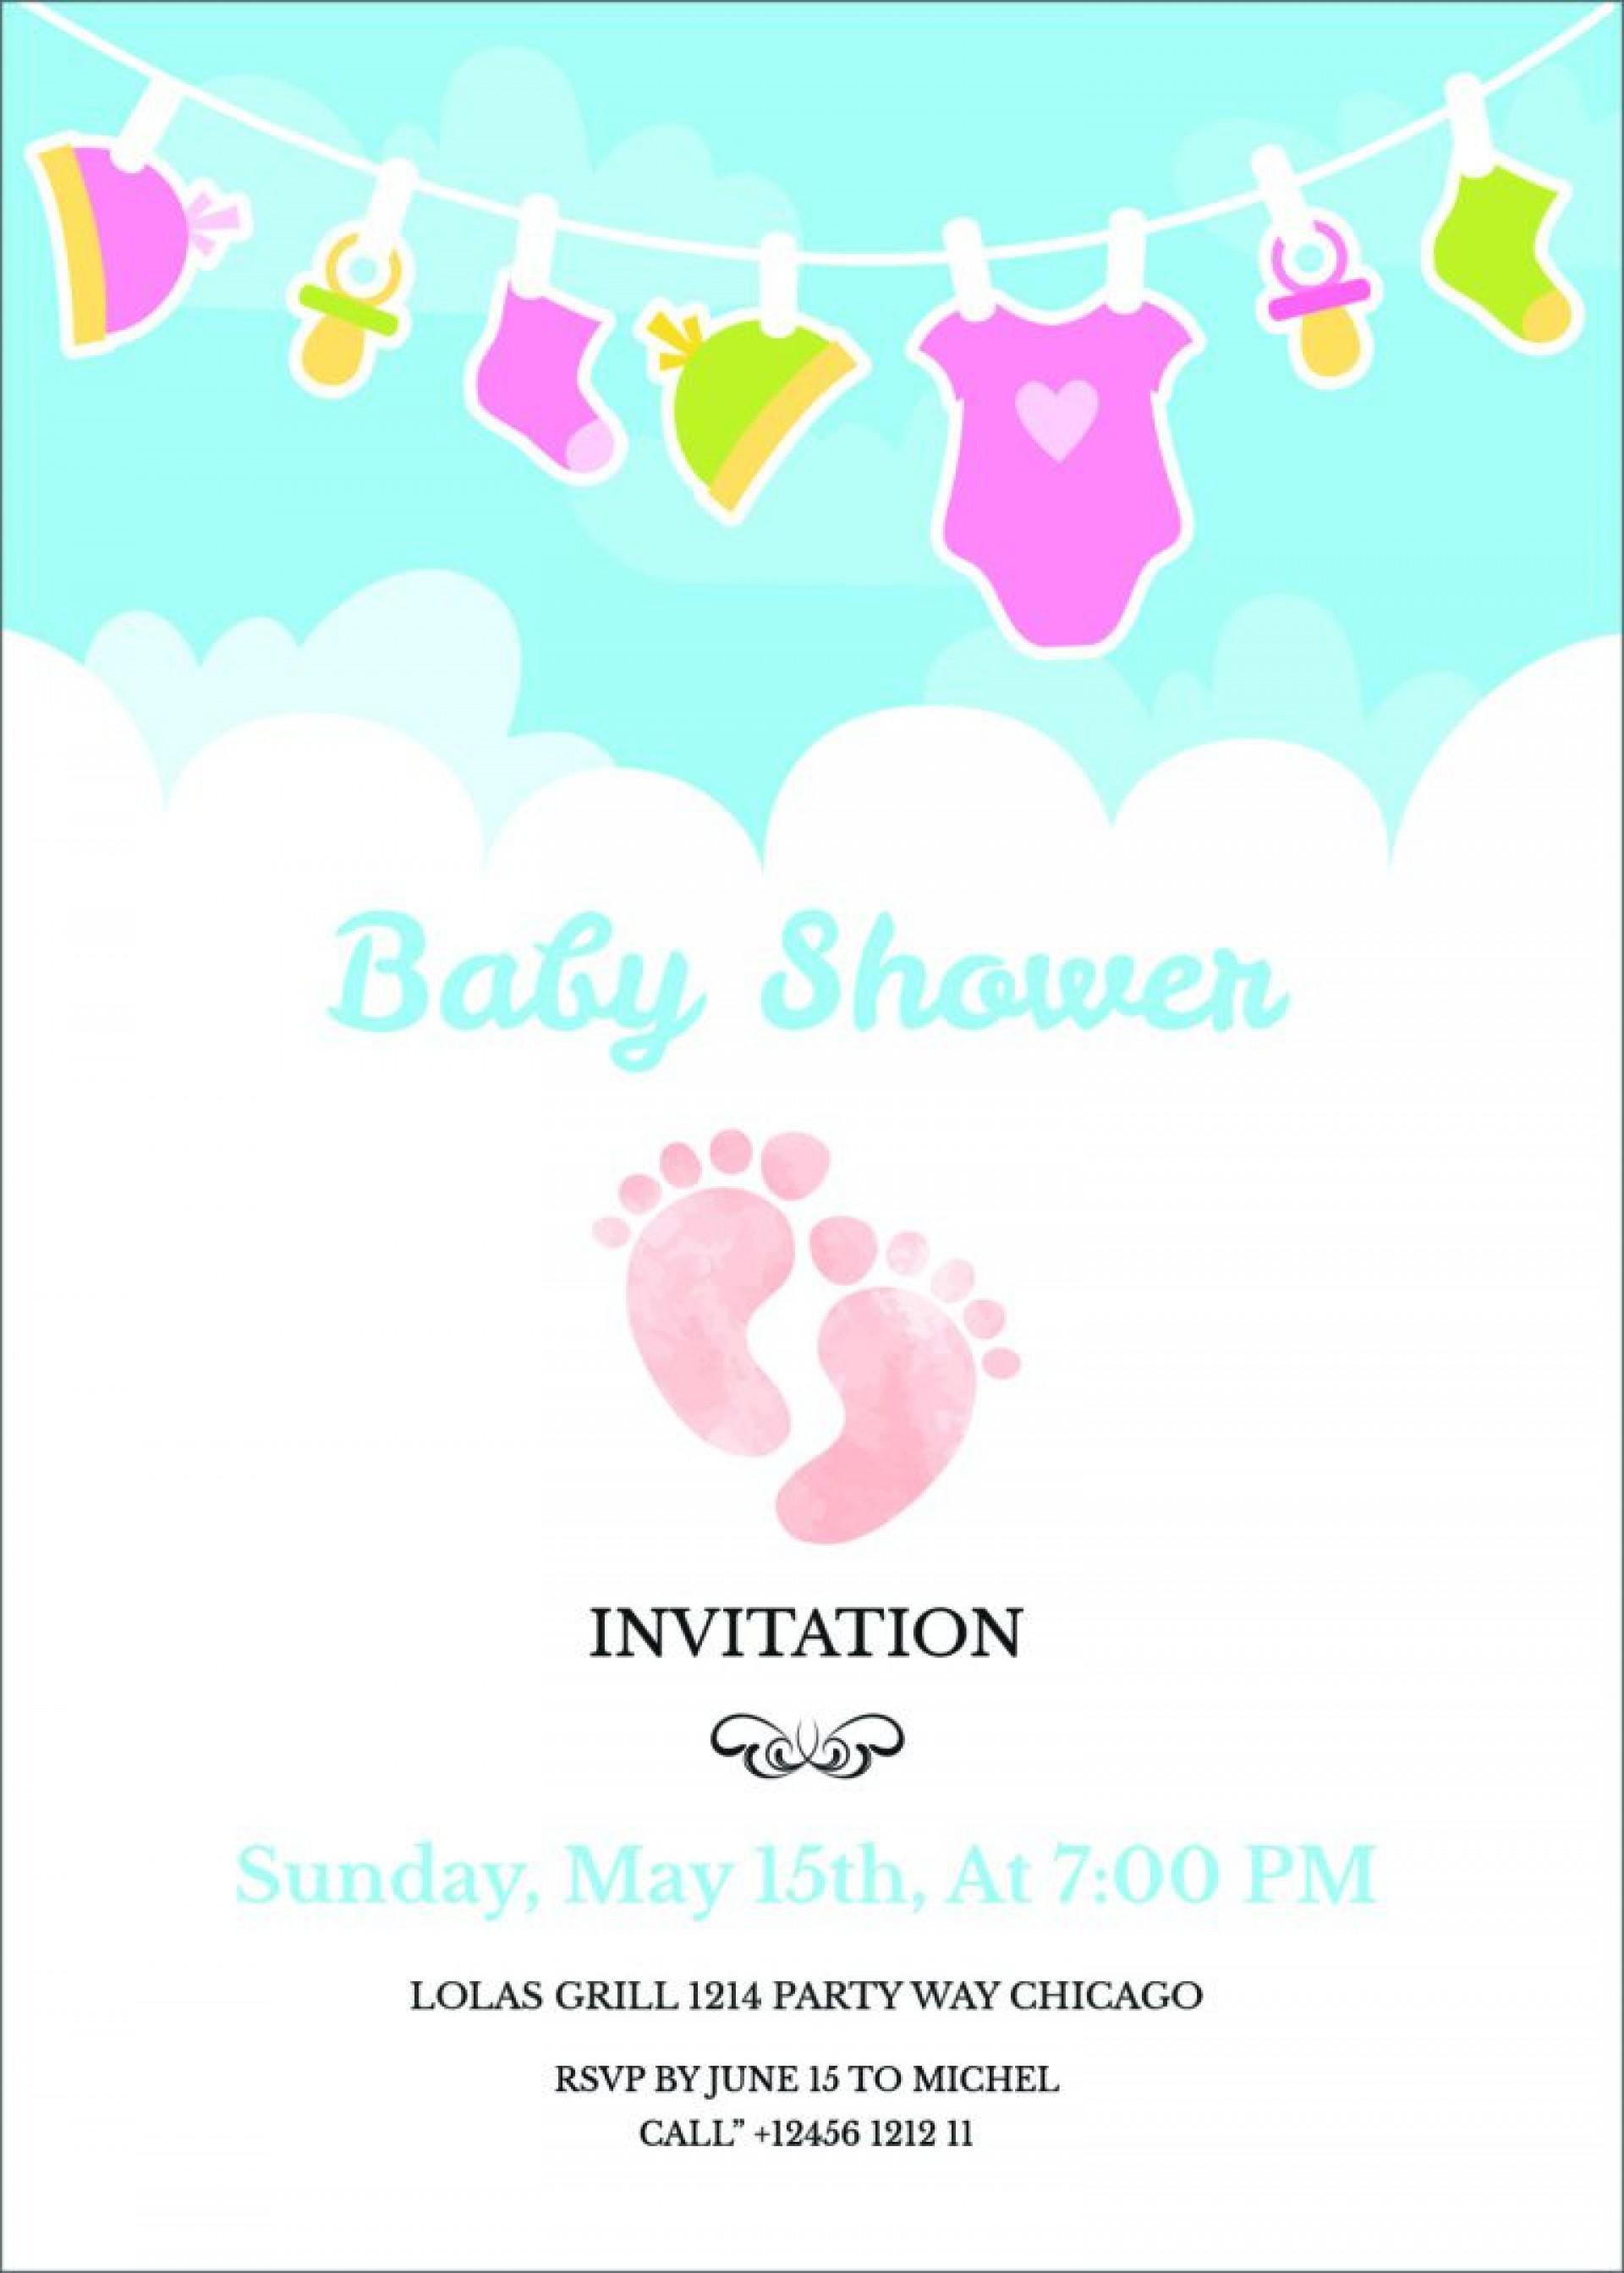 001 Striking Baby Shower Invitation Template Editable High Def  Free Surprise In Gujarati Twin1920